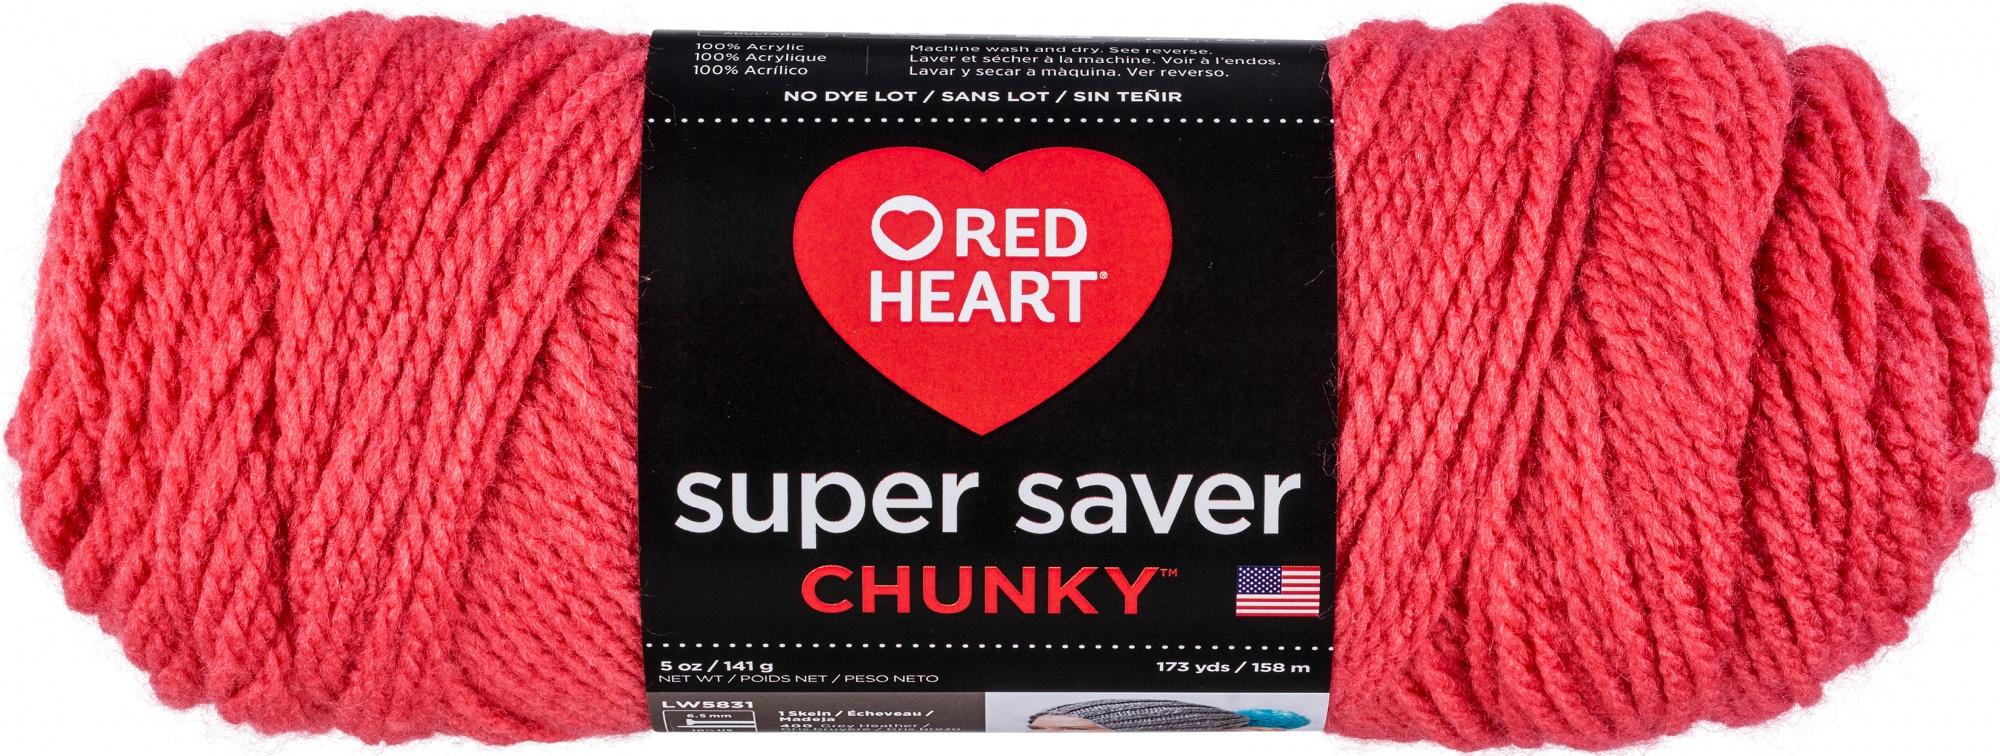 Cygnet C700//809 Candyfloss 100/% Acrylic Seriously Chunky Super Chunky Yarn 100g